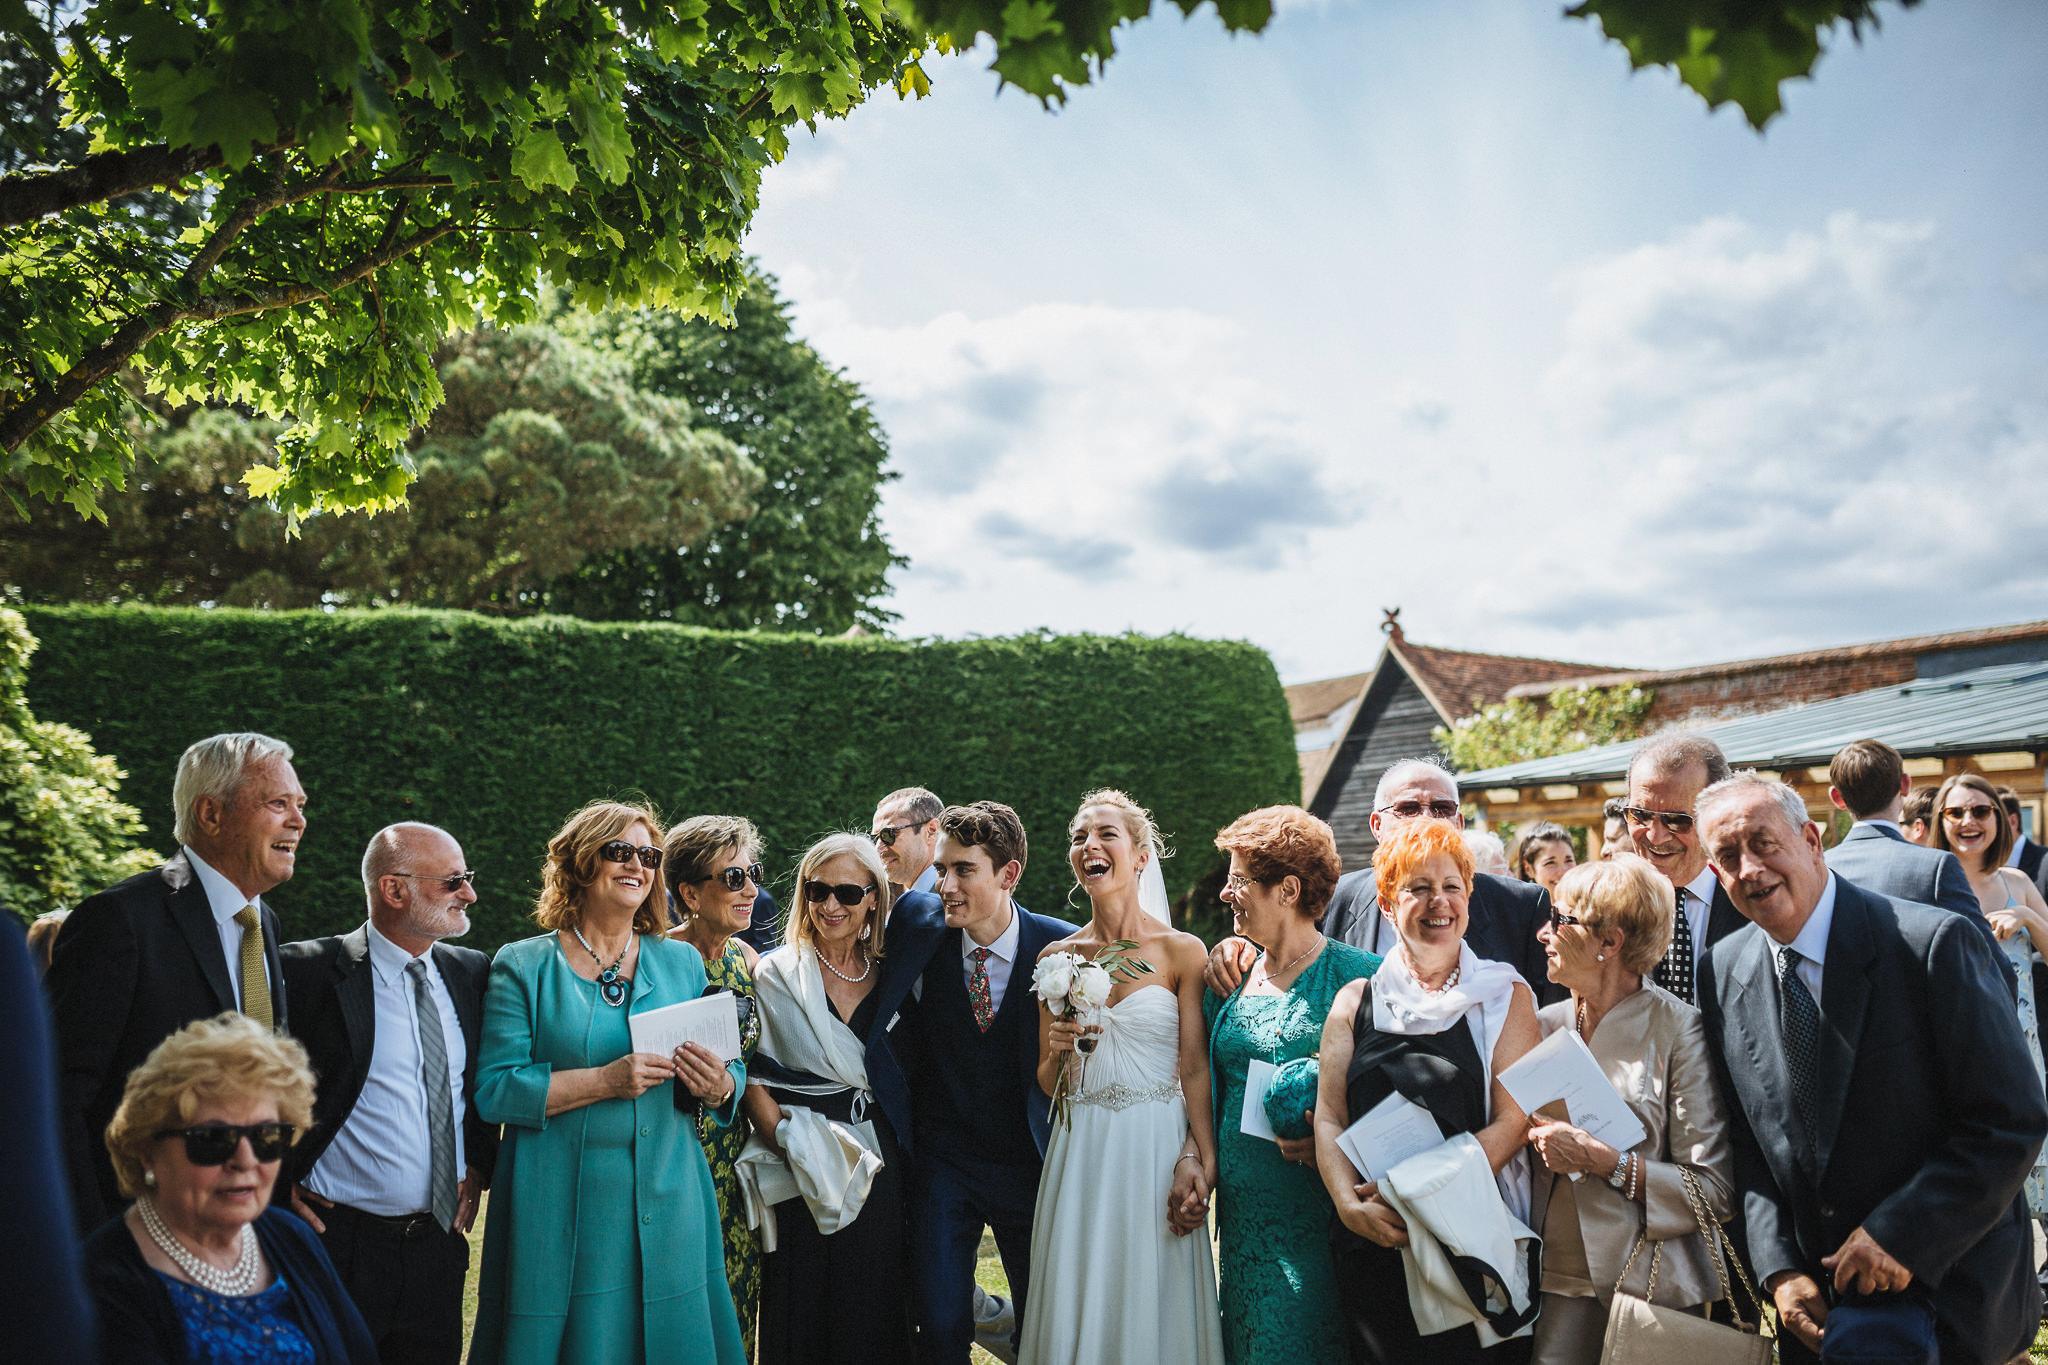 paul-marbrook-Gaynes-Park Wedding-Photographer-90086